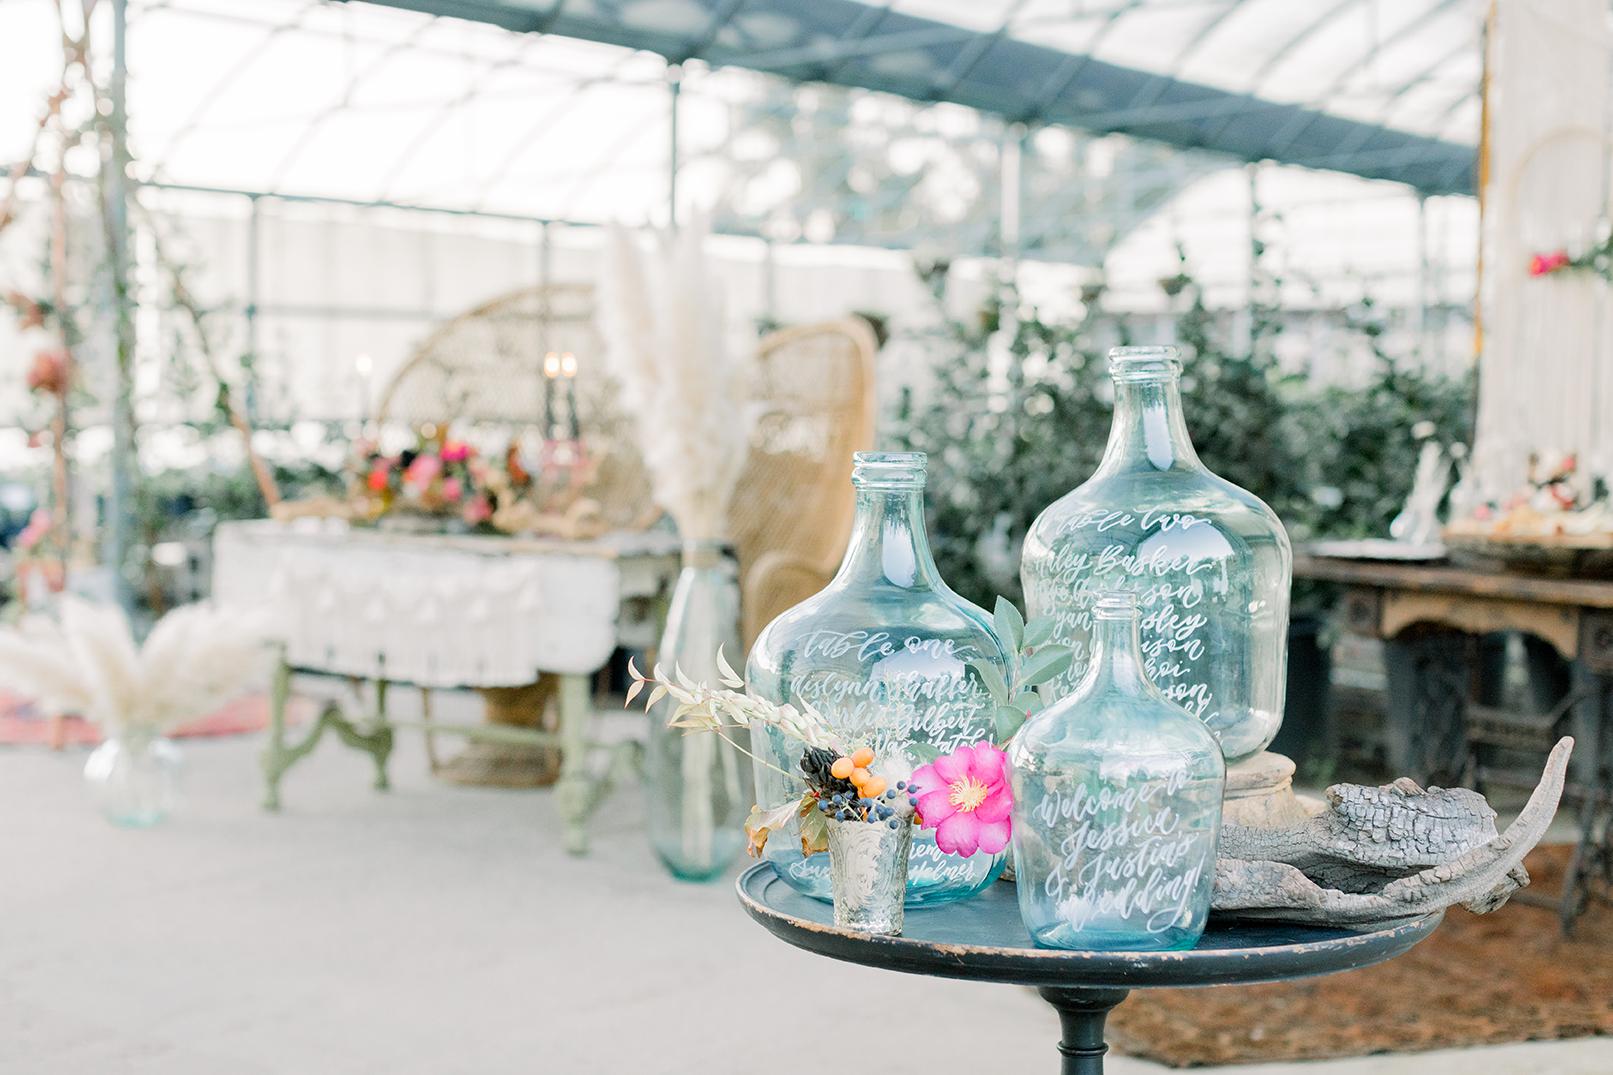 SWP-TheGreenhouse Boho Wedding Inspiration-388SWP Sam Allen Creates Seating Chart on Blue Glass Bottles